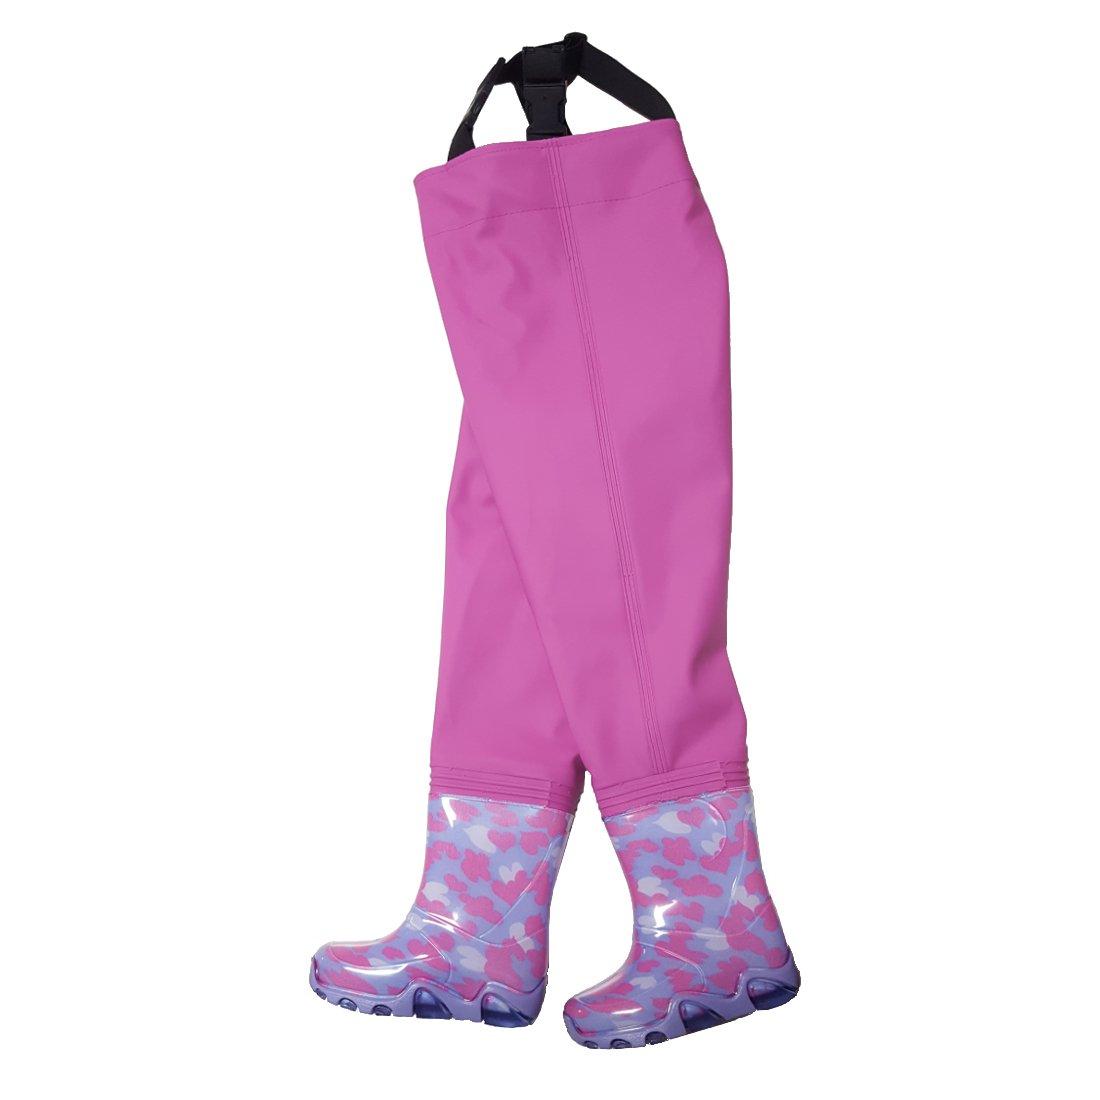 Kinderwathose Pink 24//25 Matschhose Kinder wathose Anglerhose Fischerhose Spielhose